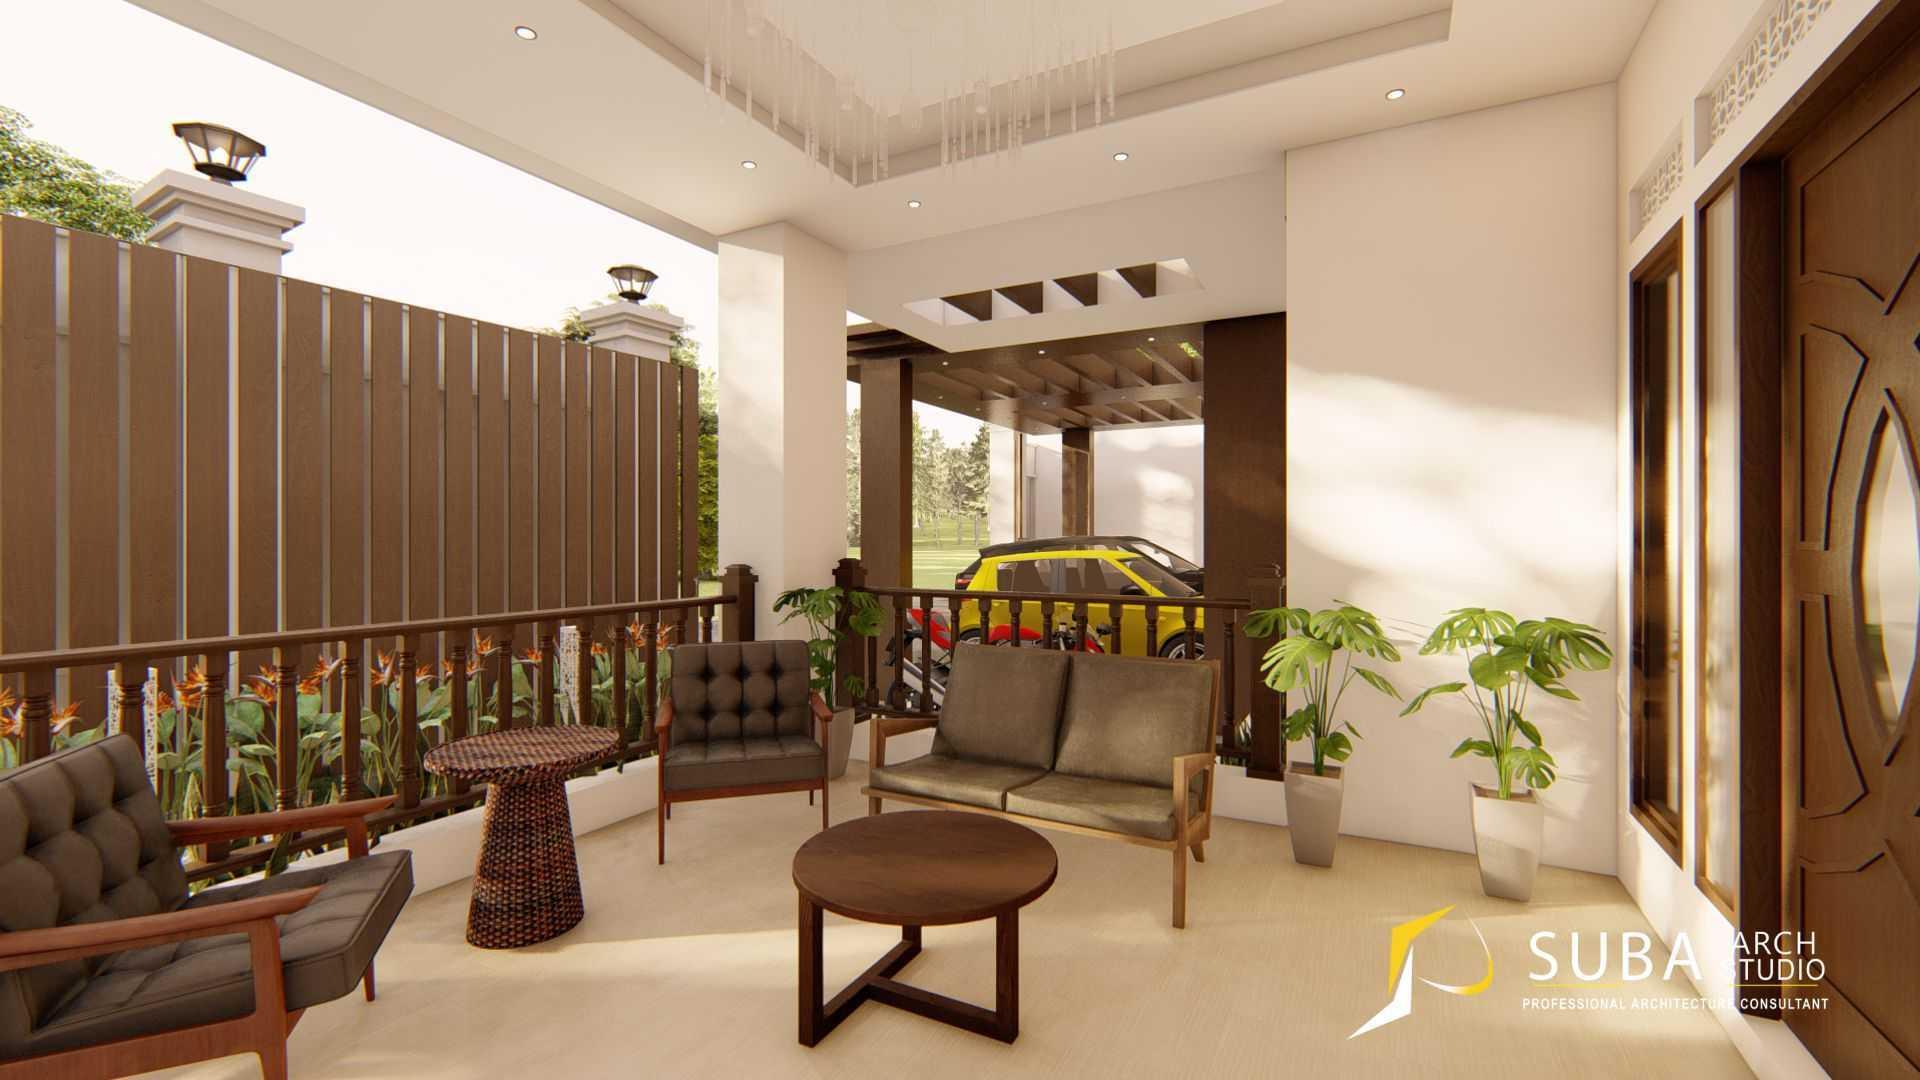 Suba-Arch Desain Rencana Pengembangan Rumah Tinggal 11 X 20,7 @mr. F Cibolang, Kec. Gn. Guruh, Sukabumi Regency, Jawa Barat, Indonesia Cibolang, Kec. Gn. Guruh, Sukabumi Regency, Jawa Barat, Indonesia Suba-Arch-Desain-Rencana-Pengembangan-Rumah-Tinggal-11-X-207-Mr-F  86879